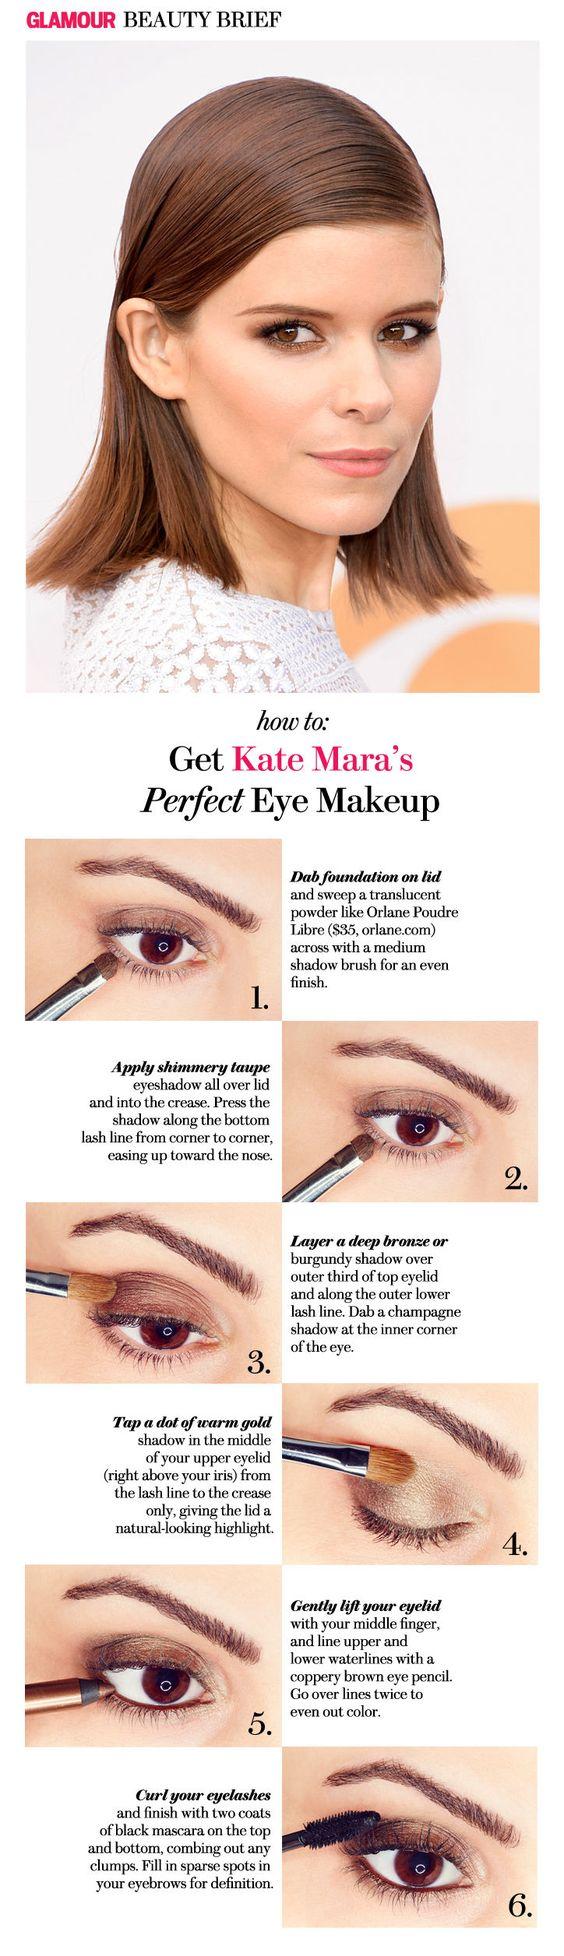 How to copy Kate Mara's smoky eye makeup